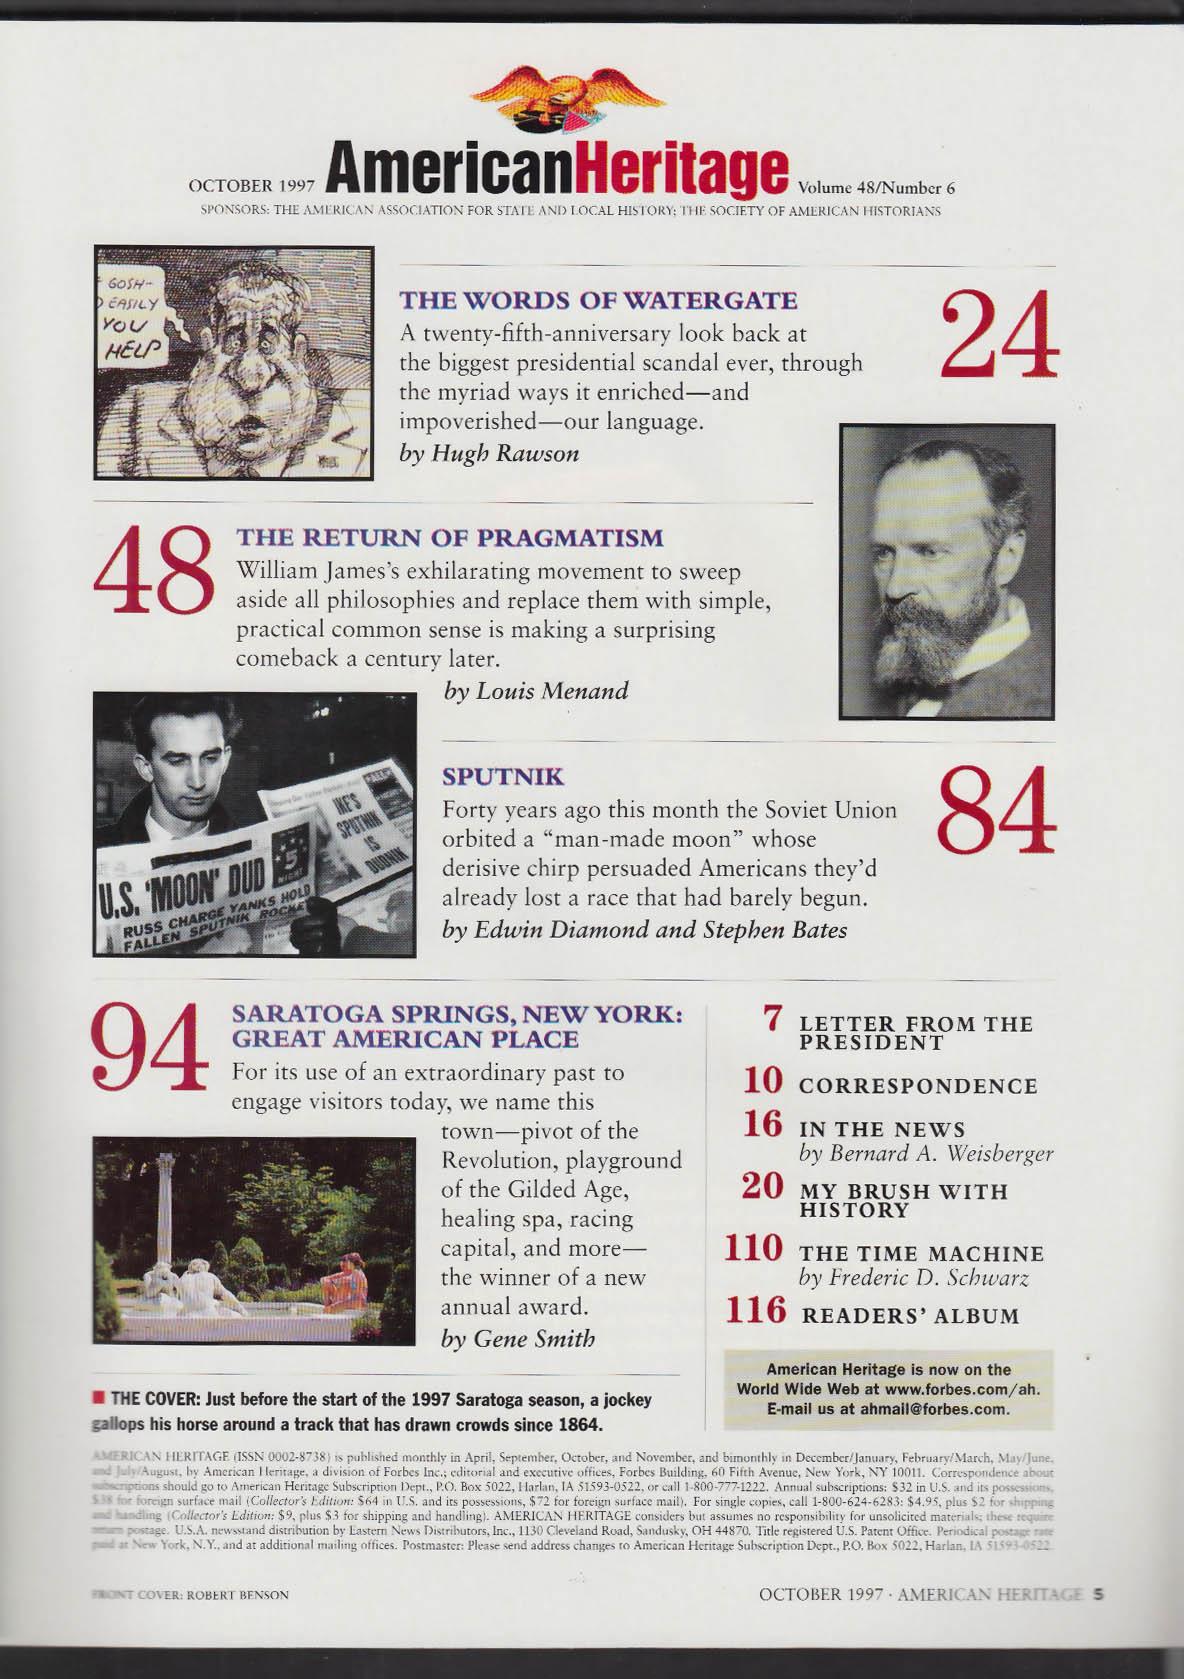 AMERICAN HERITAGE Saratoga Springs Watergate William James Pragmatism + 10 1997